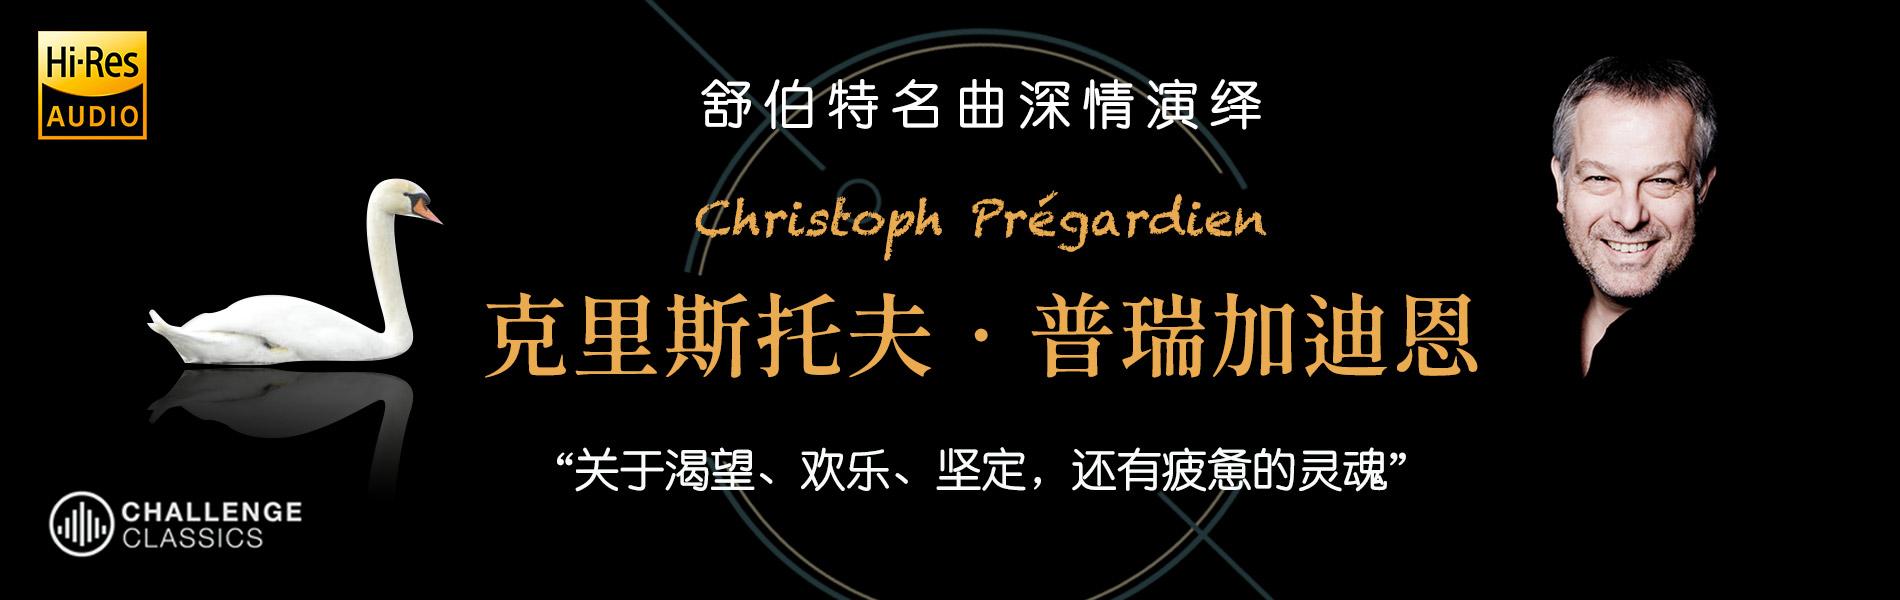 christophweb